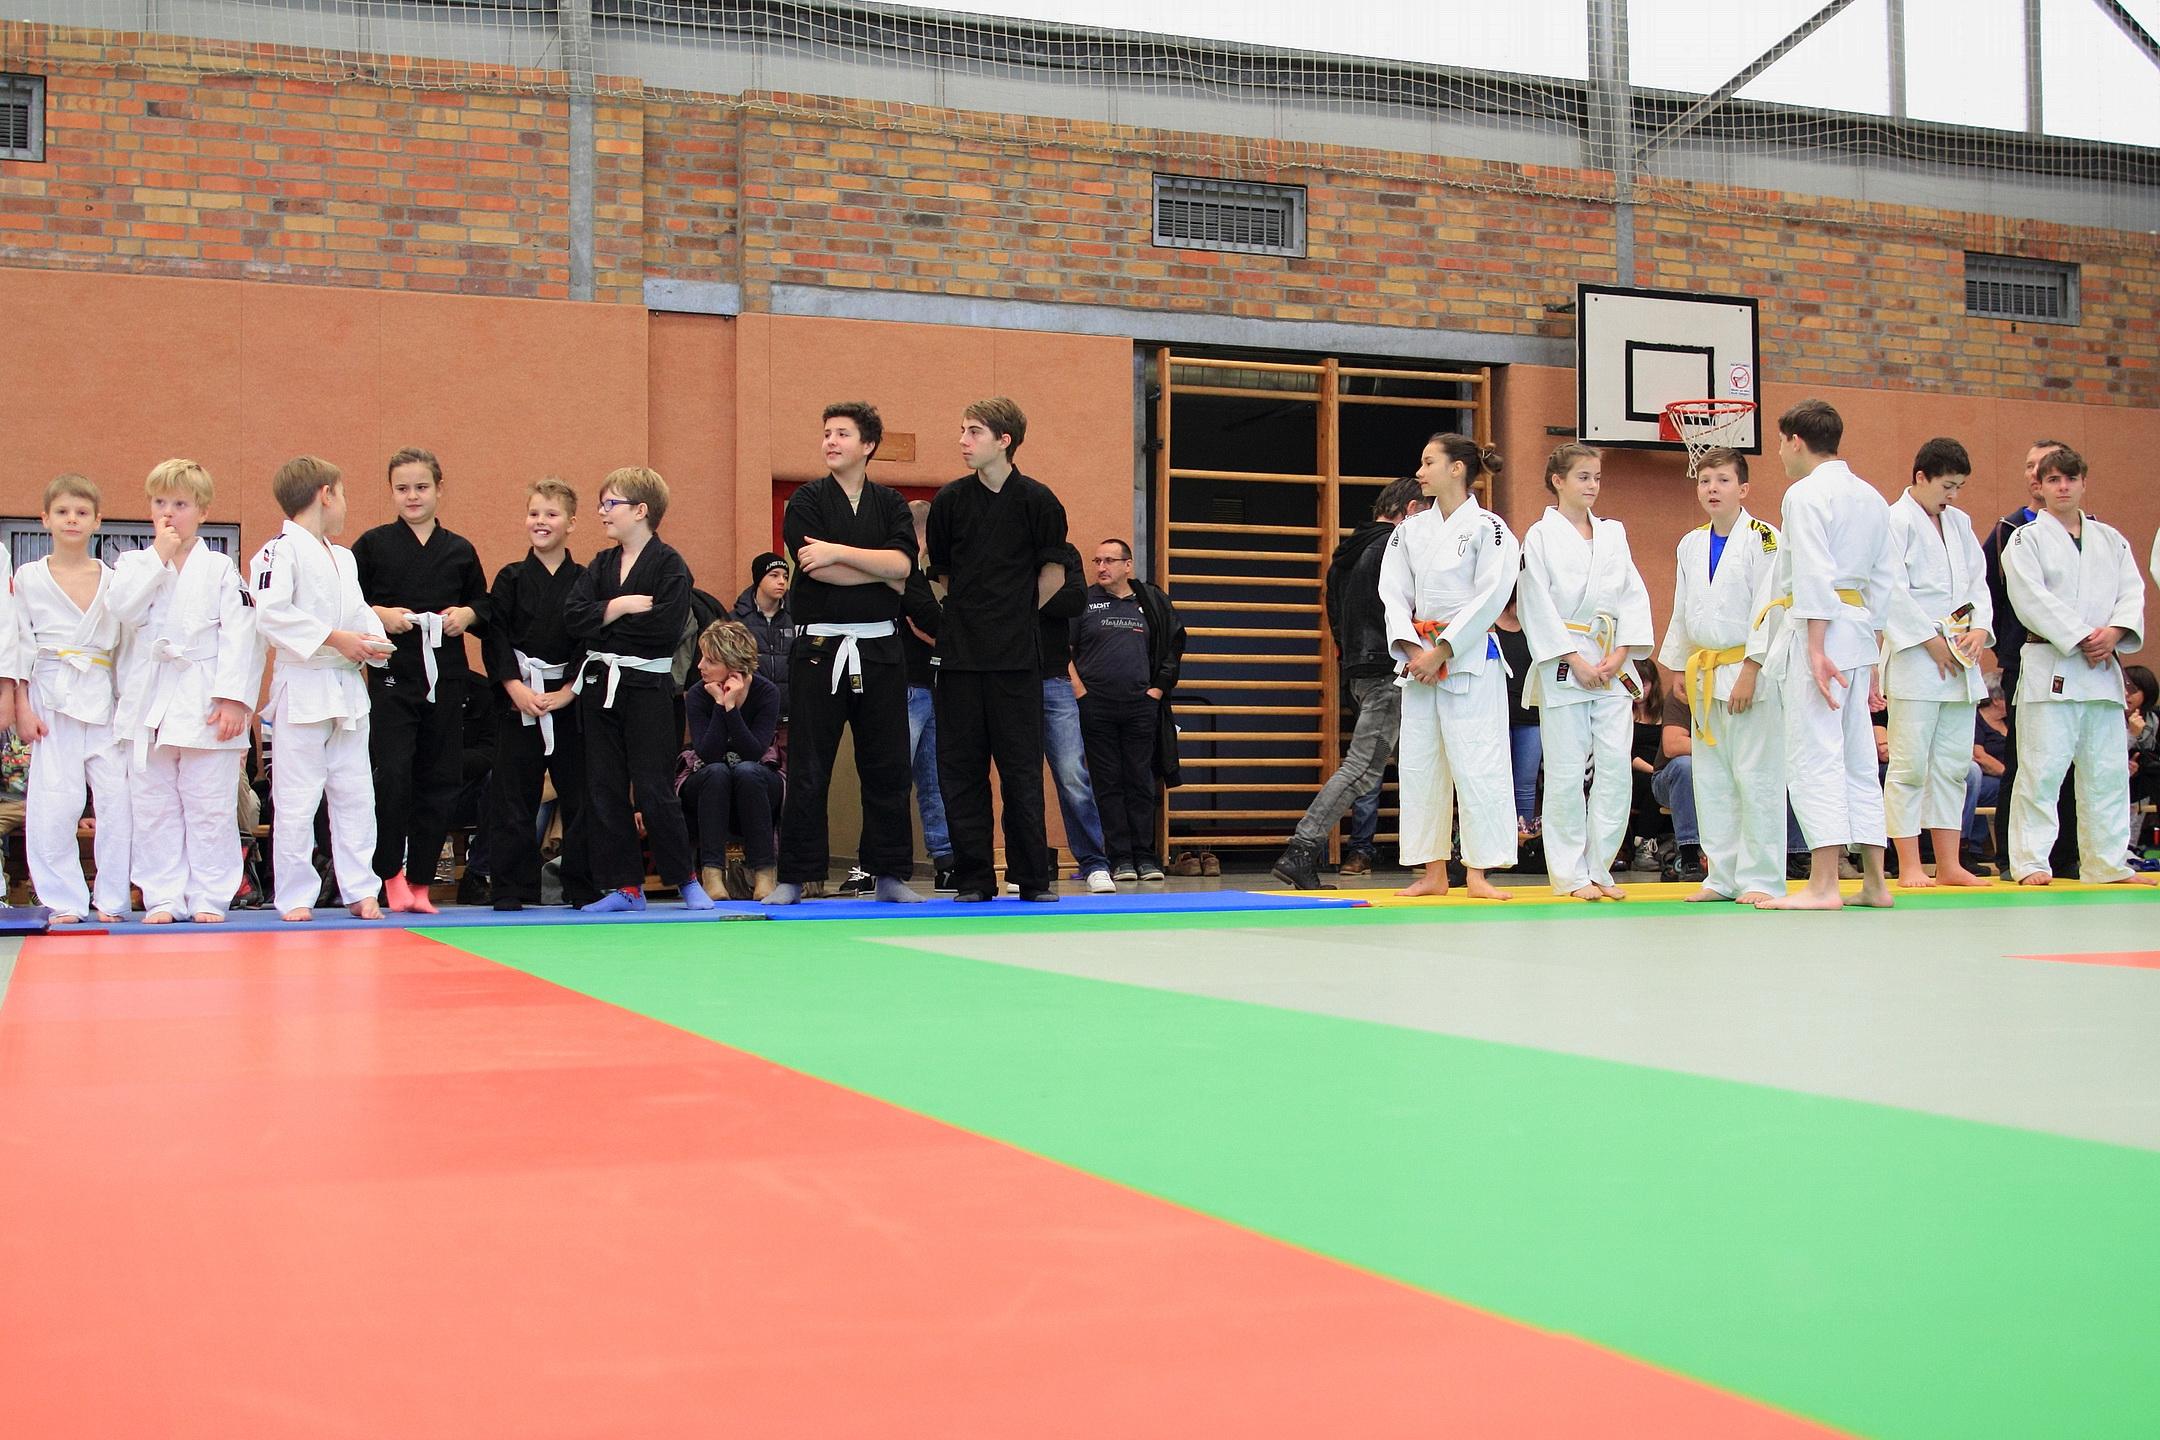 2016-Nikolausturnier Judokas Schwedt (6)